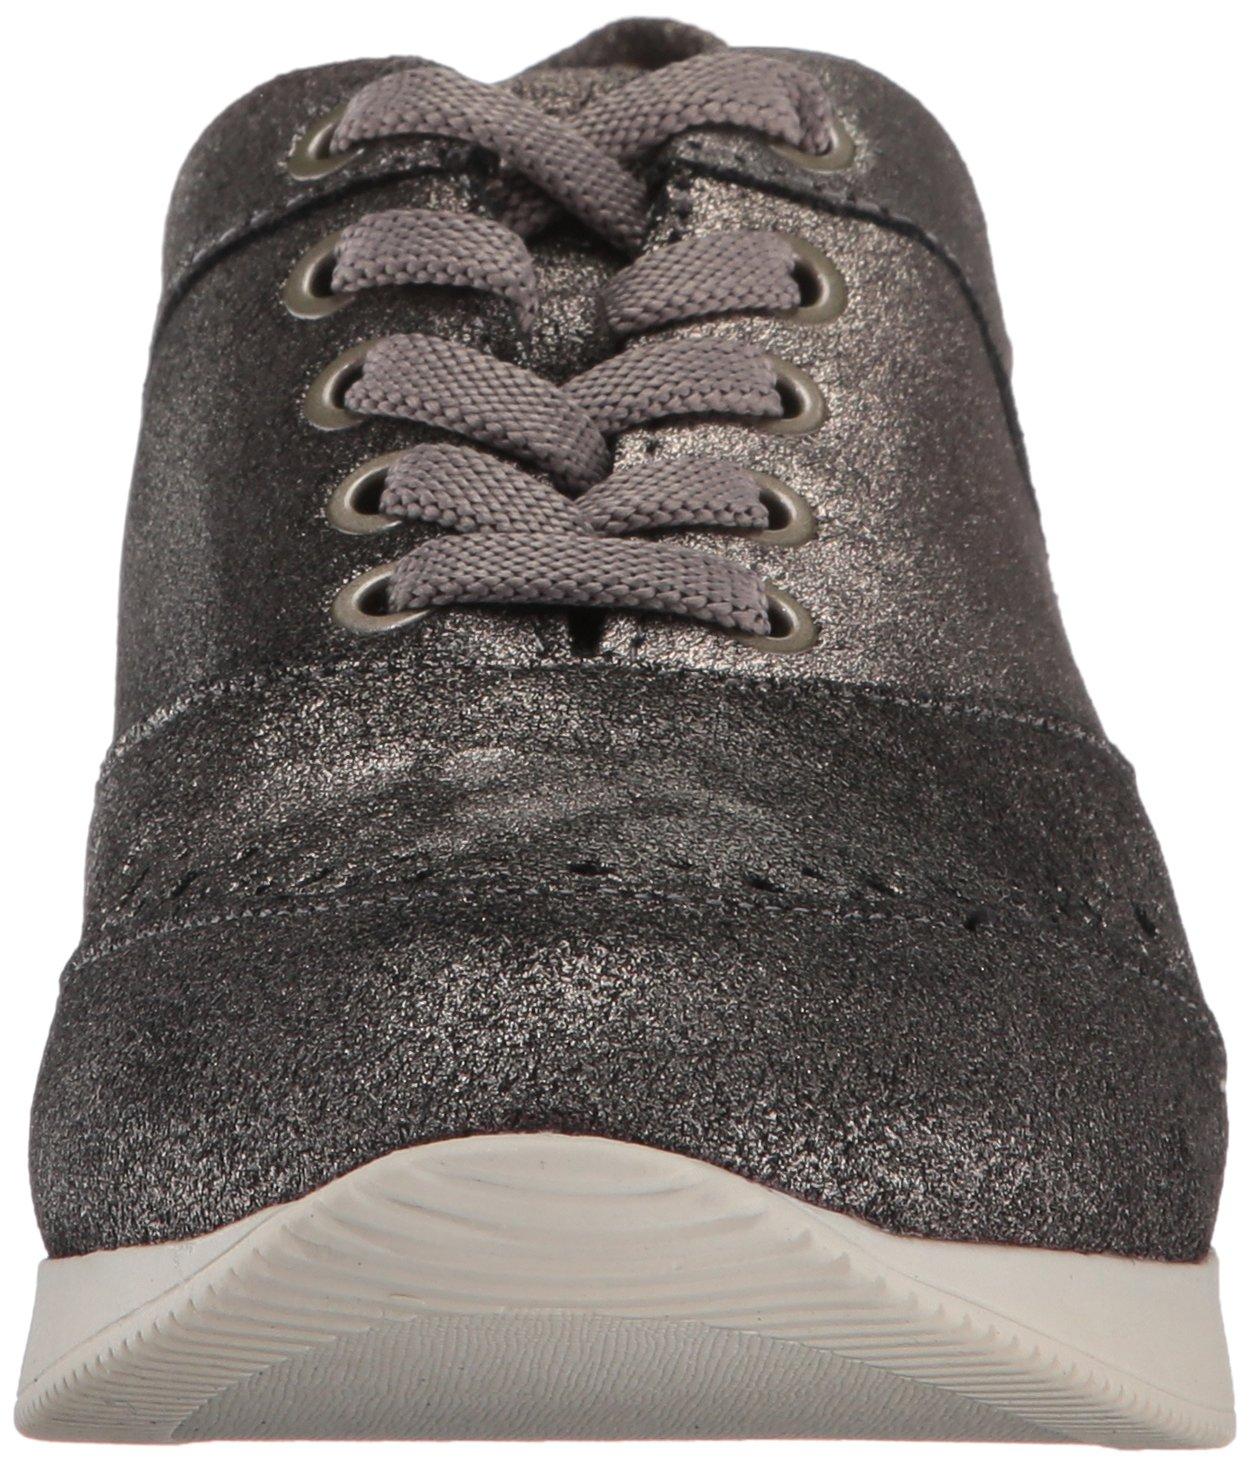 Naturalizer Sneaker Women's Jimi 2 Fashion Sneaker Naturalizer B06Y5G42ND 9.5 W US|Pewter 9fc252